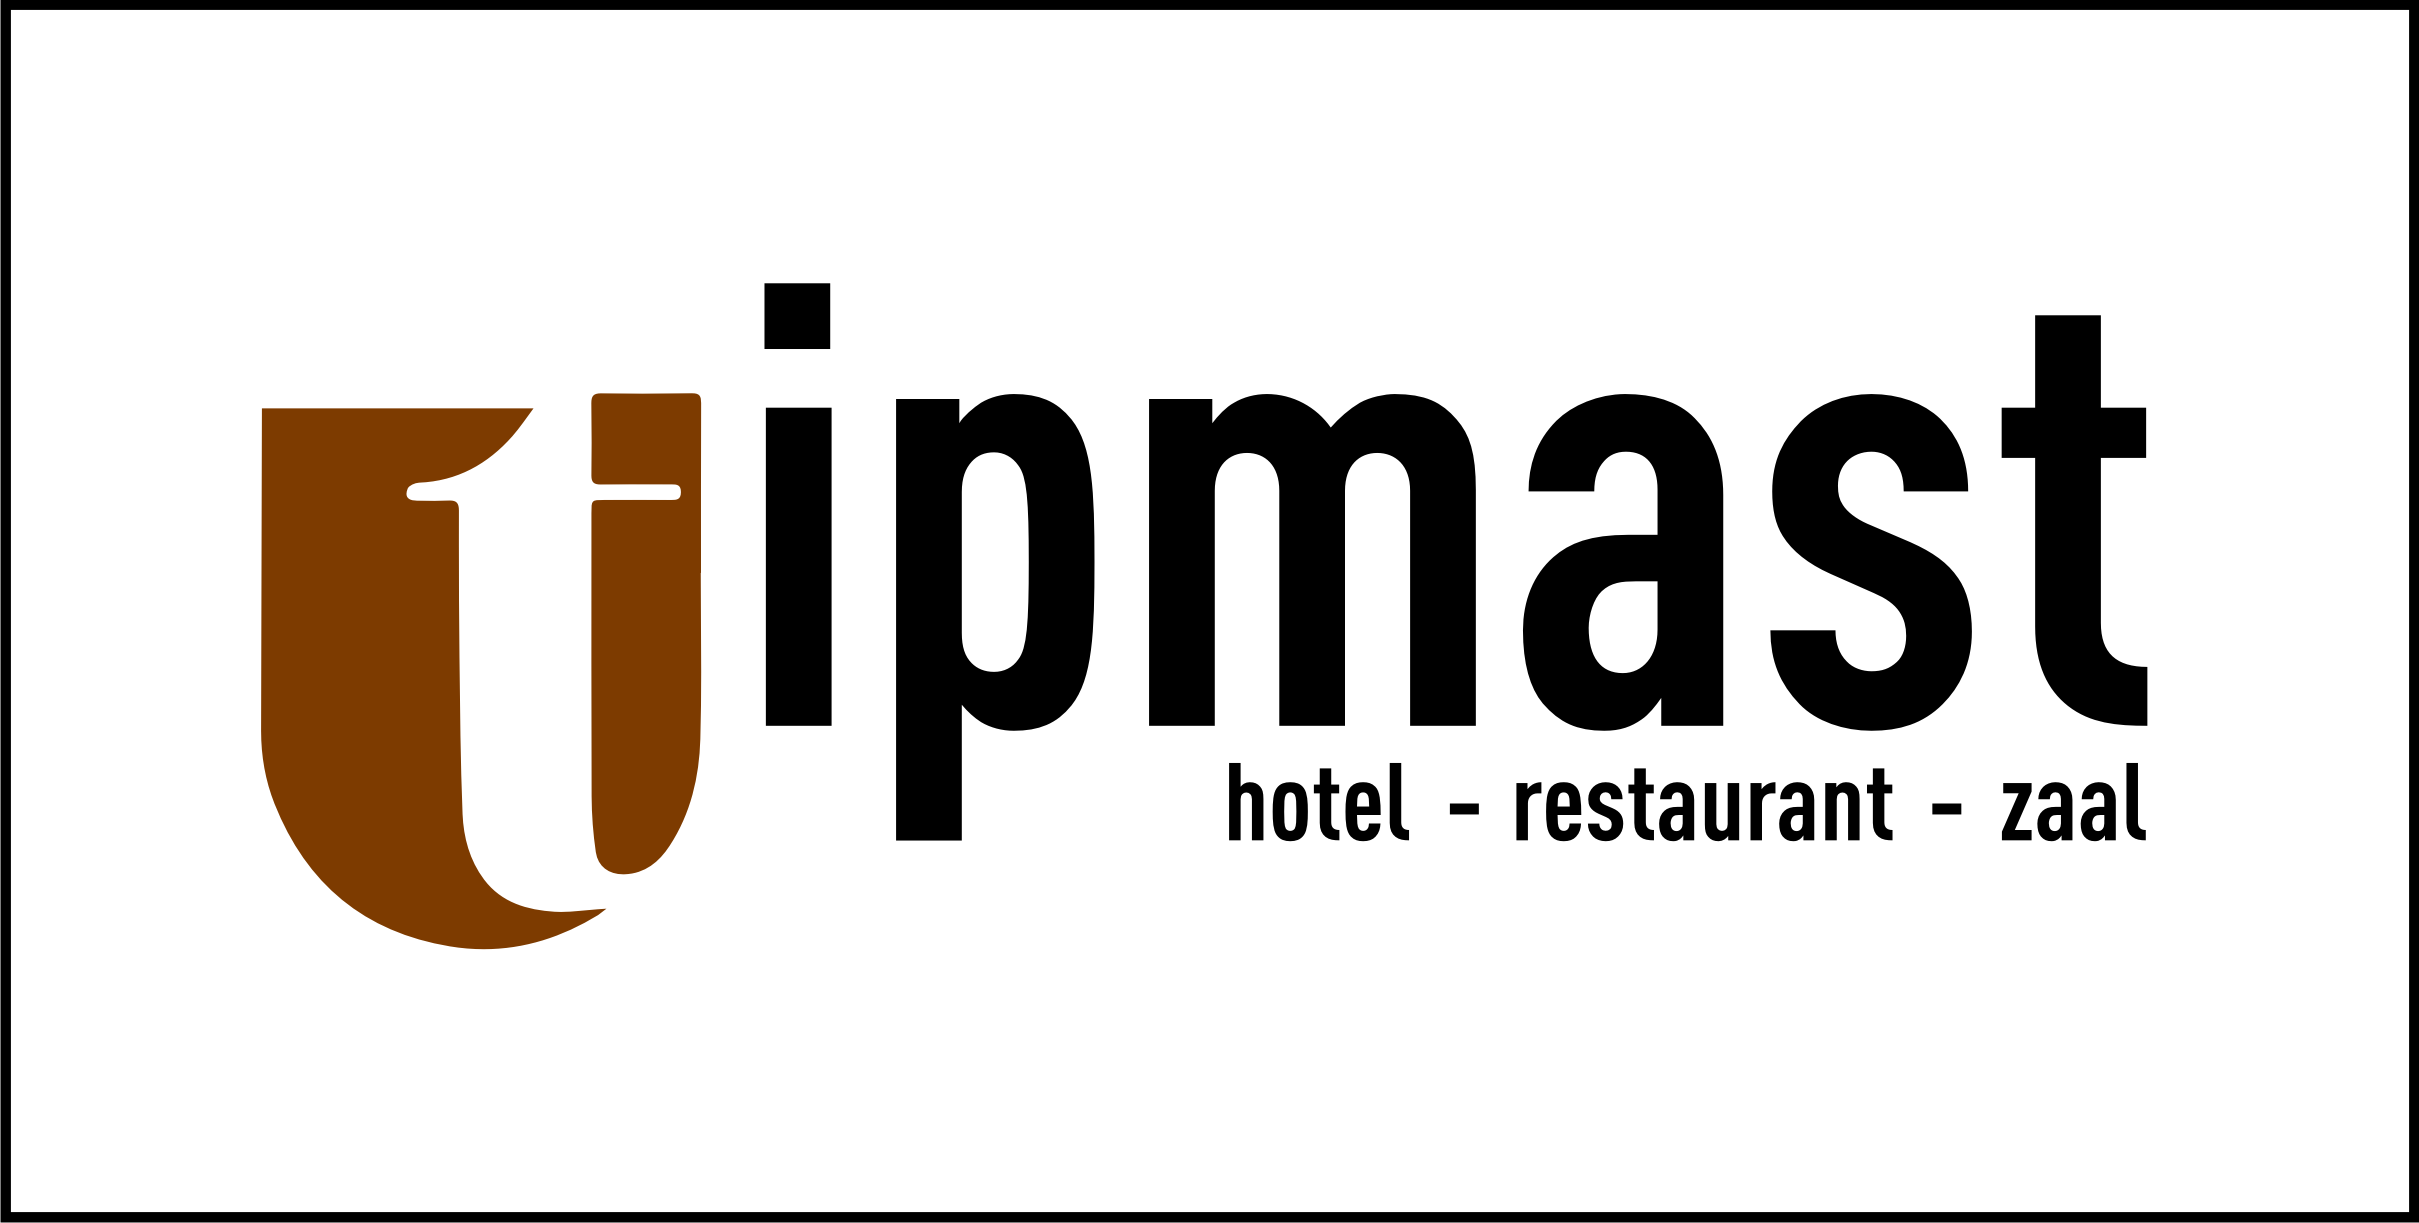 Hotel de Tipmast